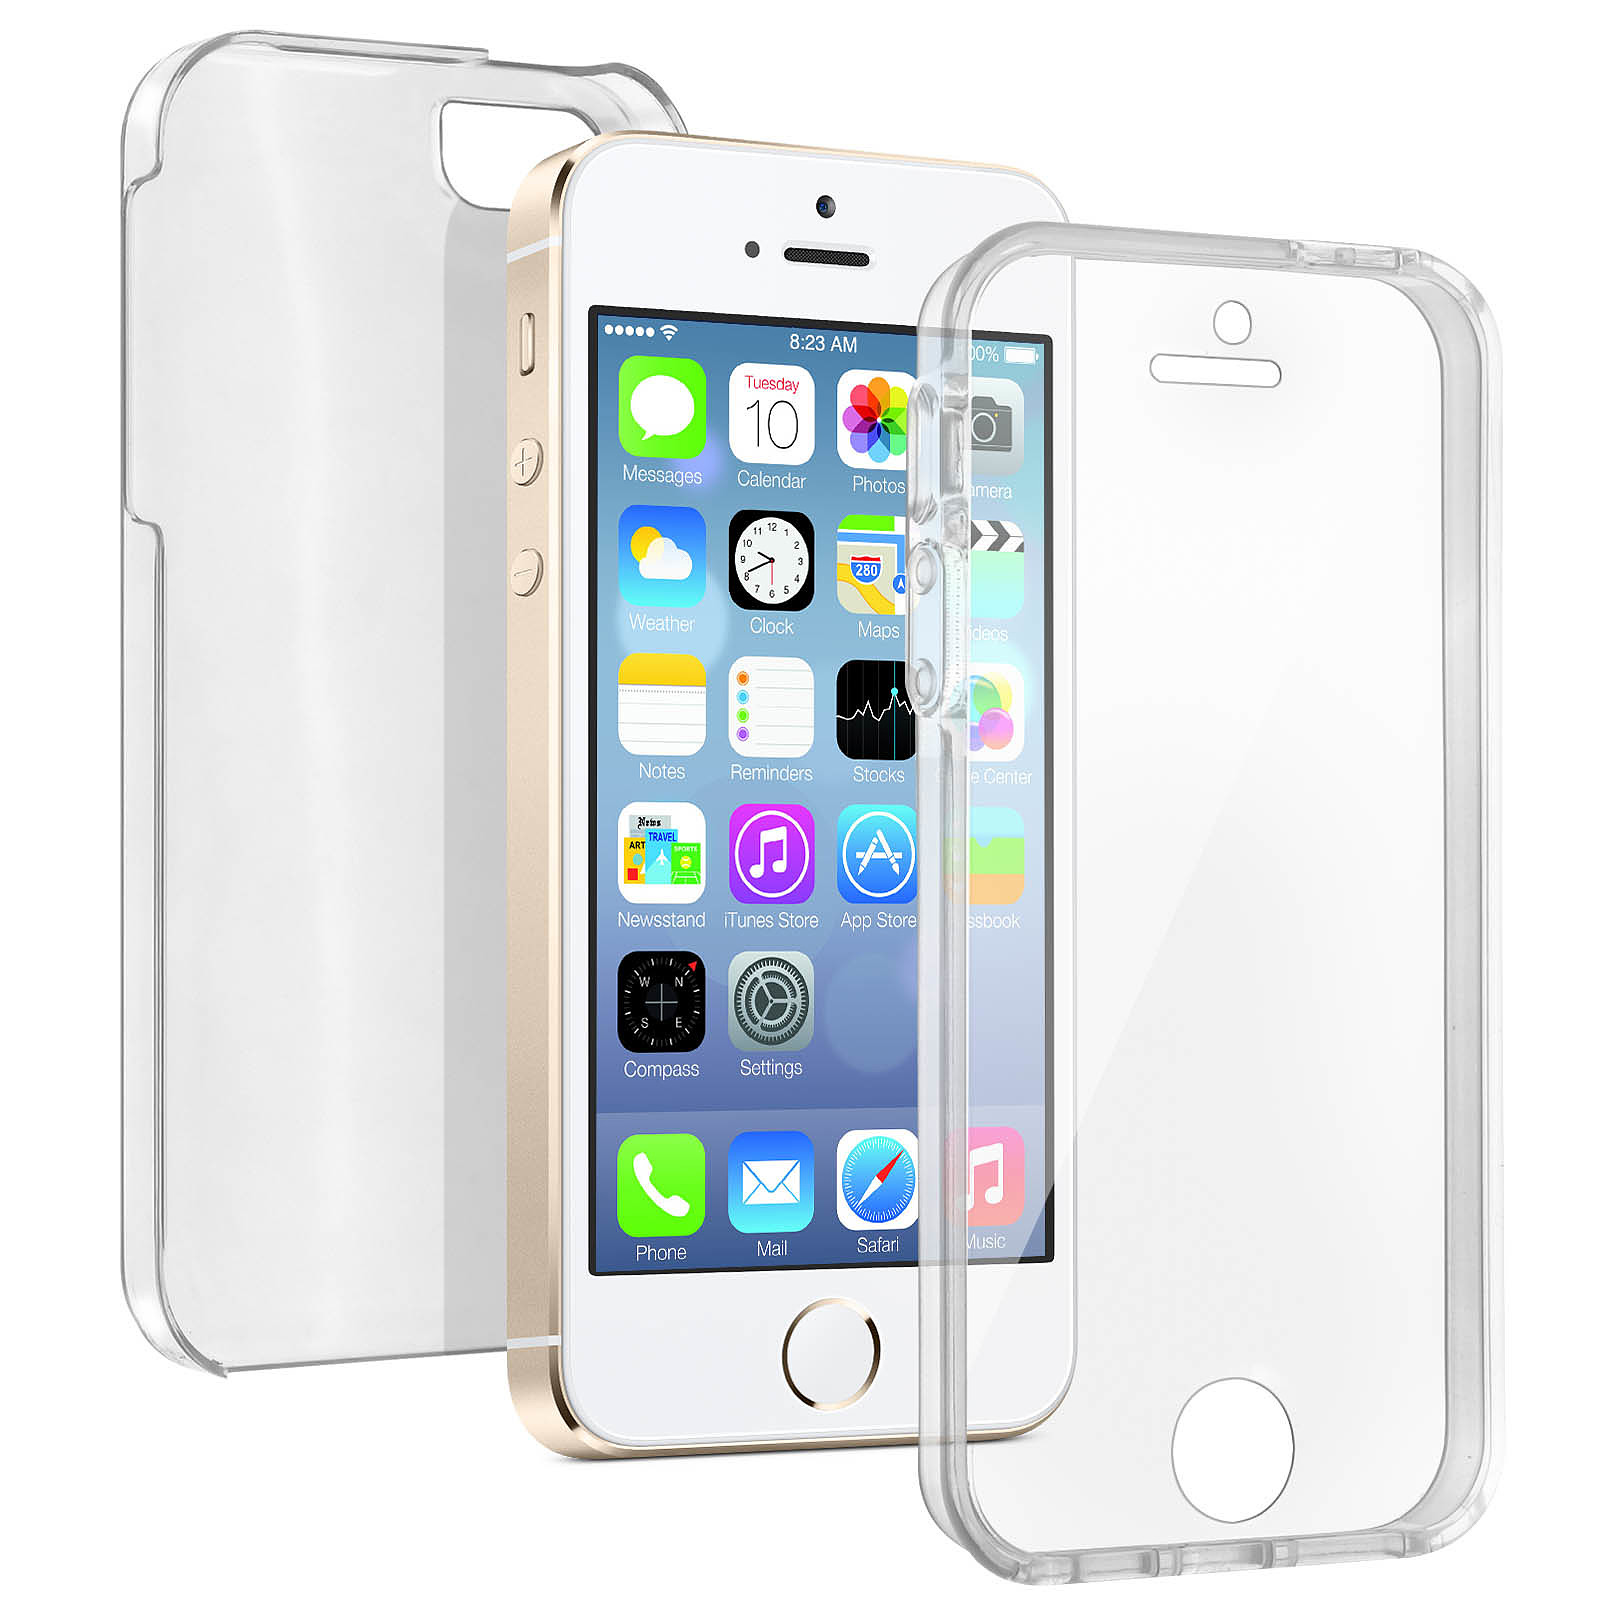 Avizar Coque Transparent pour Apple iPhone 5 , Apple iPhone 5S , Apple iPhone SE